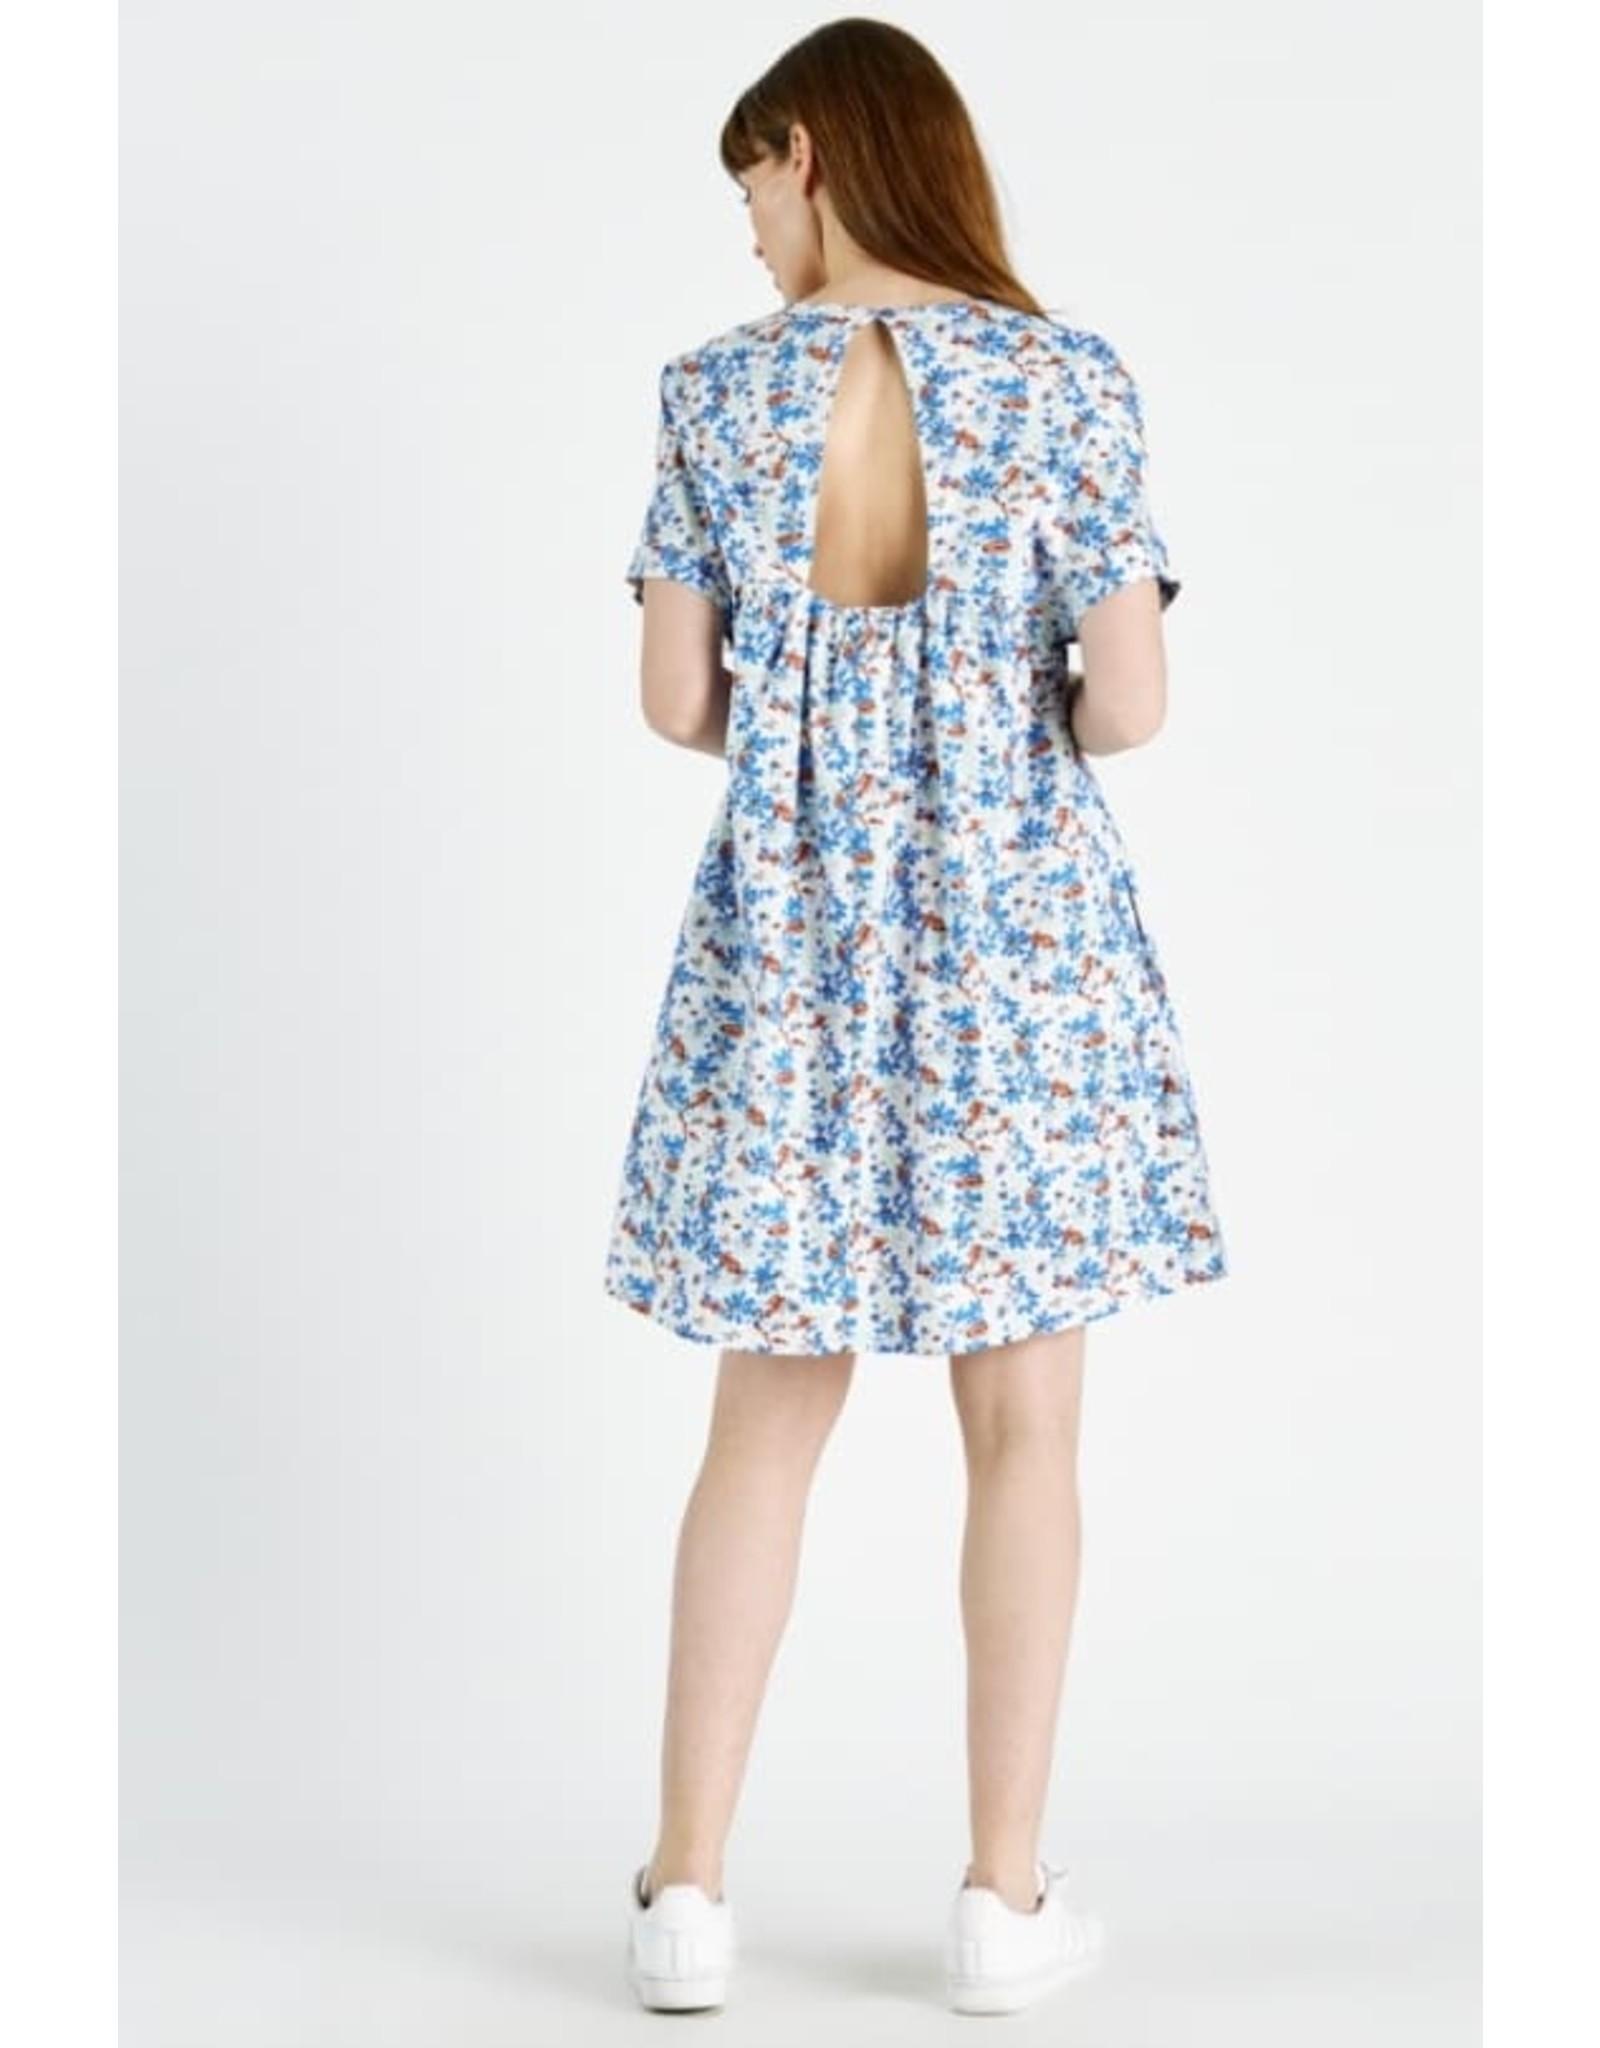 SUMMER FLORAL DRESS BLUE